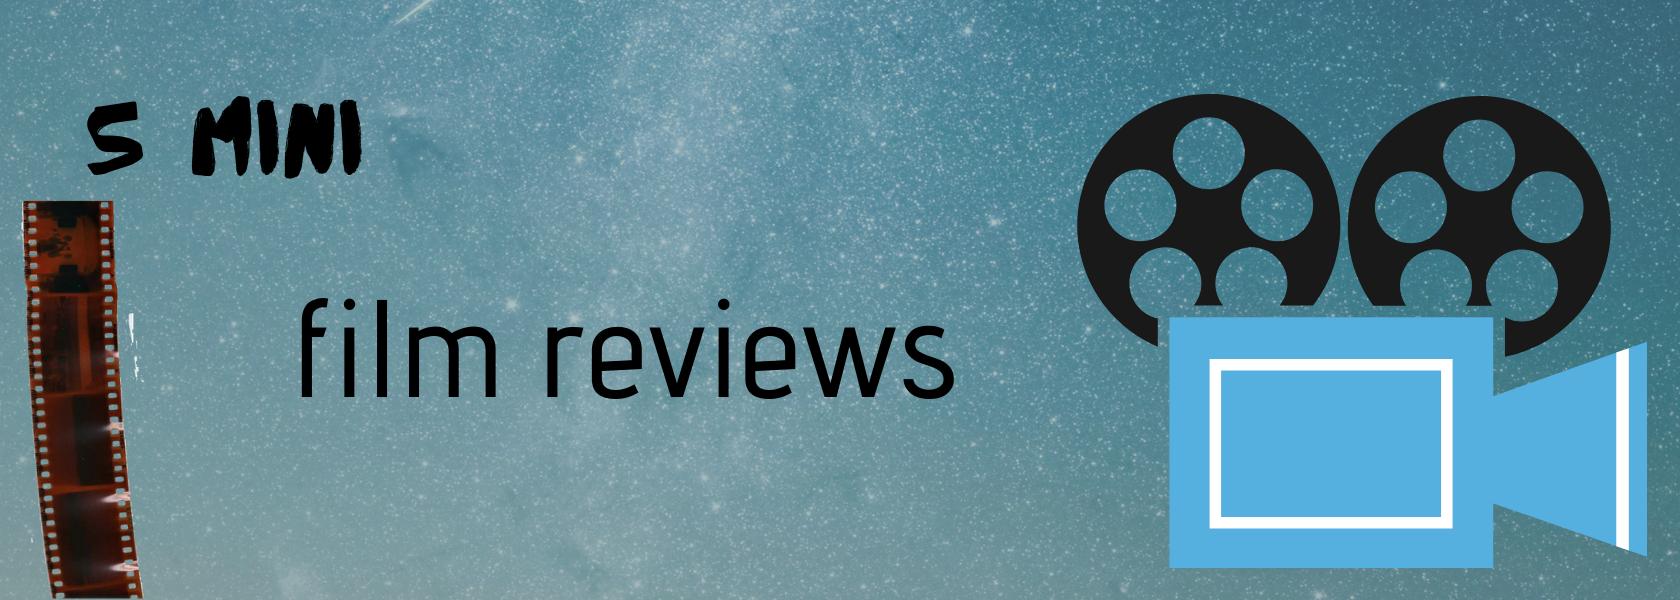 5 mini film reviews